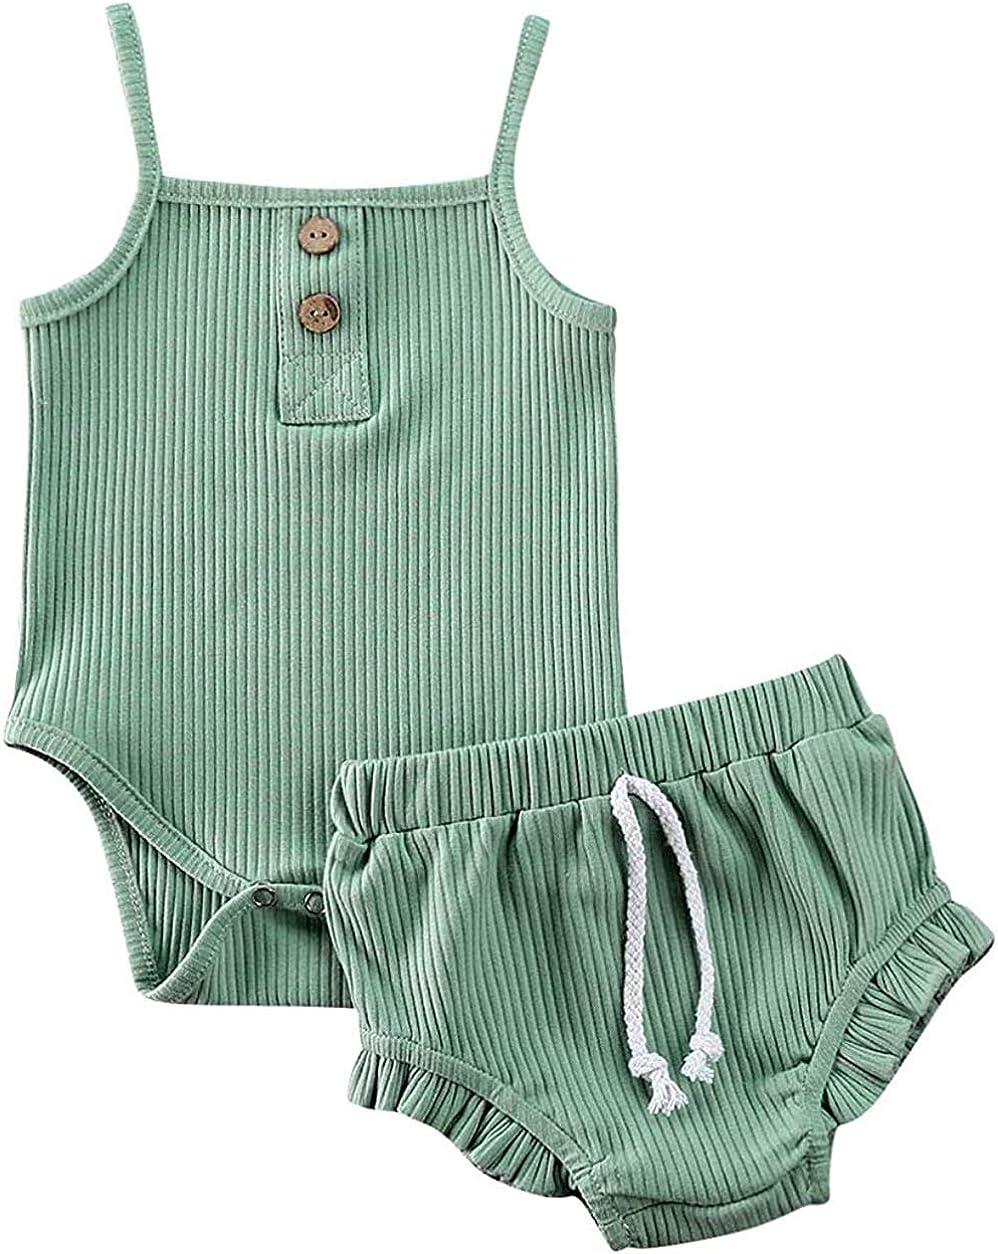 Newborn SALENEW very popular! Infant Baby Girl Sleeveless Knitted Clothes Vest Ruffled Award